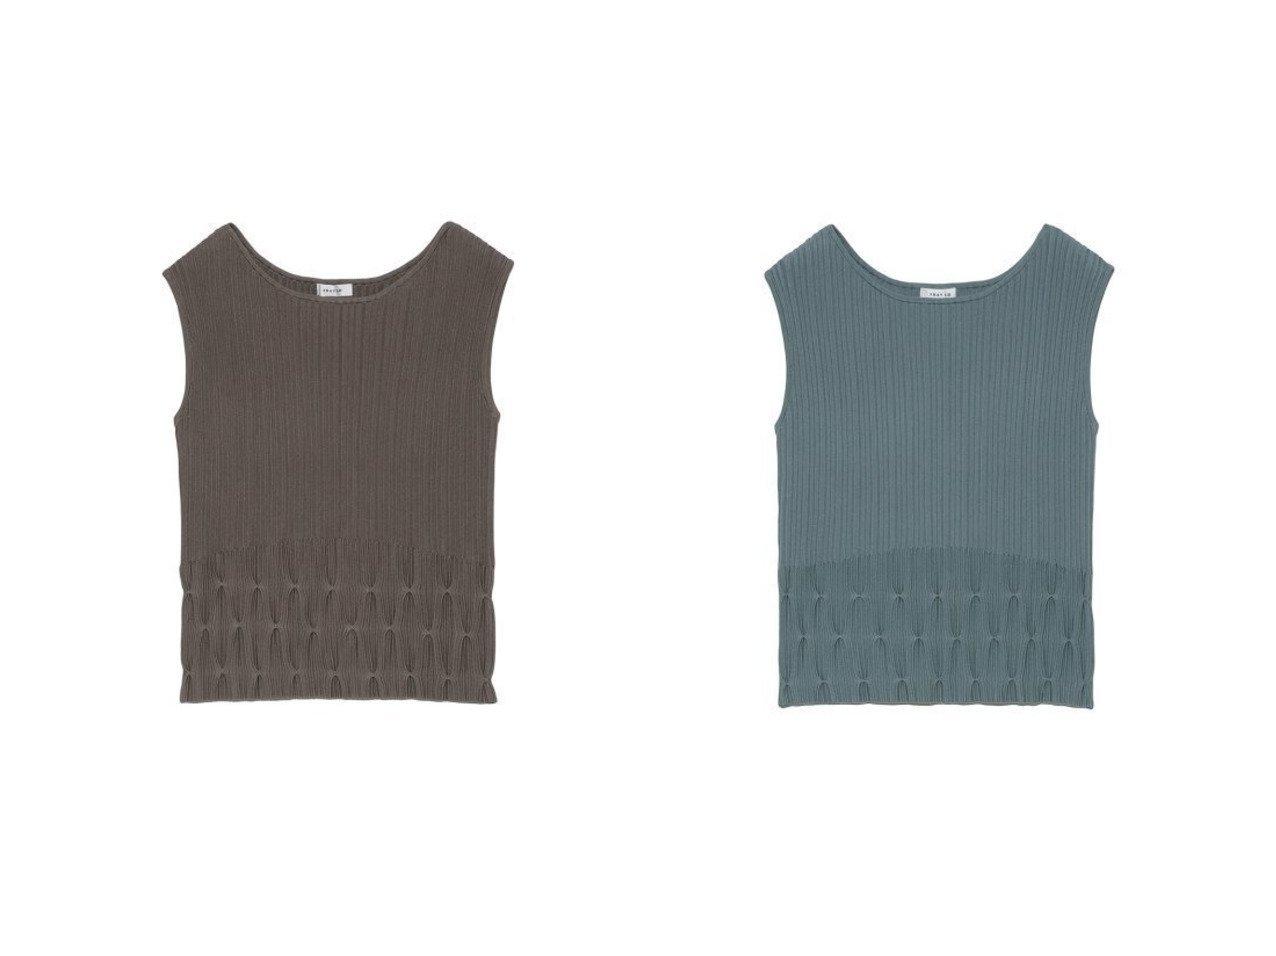 【FRAY I.D/フレイ アイディー】のピンタックニットプルオーバー 【トップス・カットソー】おすすめ!人気、トレンド・レディースファッションの通販   おすすめで人気の流行・トレンド、ファッションの通販商品 インテリア・家具・メンズファッション・キッズファッション・レディースファッション・服の通販 founy(ファニー) https://founy.com/ ファッション Fashion レディースファッション WOMEN トップス・カットソー Tops/Tshirt ニット Knit Tops プルオーバー Pullover スマート セットアップ セーター 再入荷 Restock/Back in Stock/Re Arrival |ID:crp329100000053738